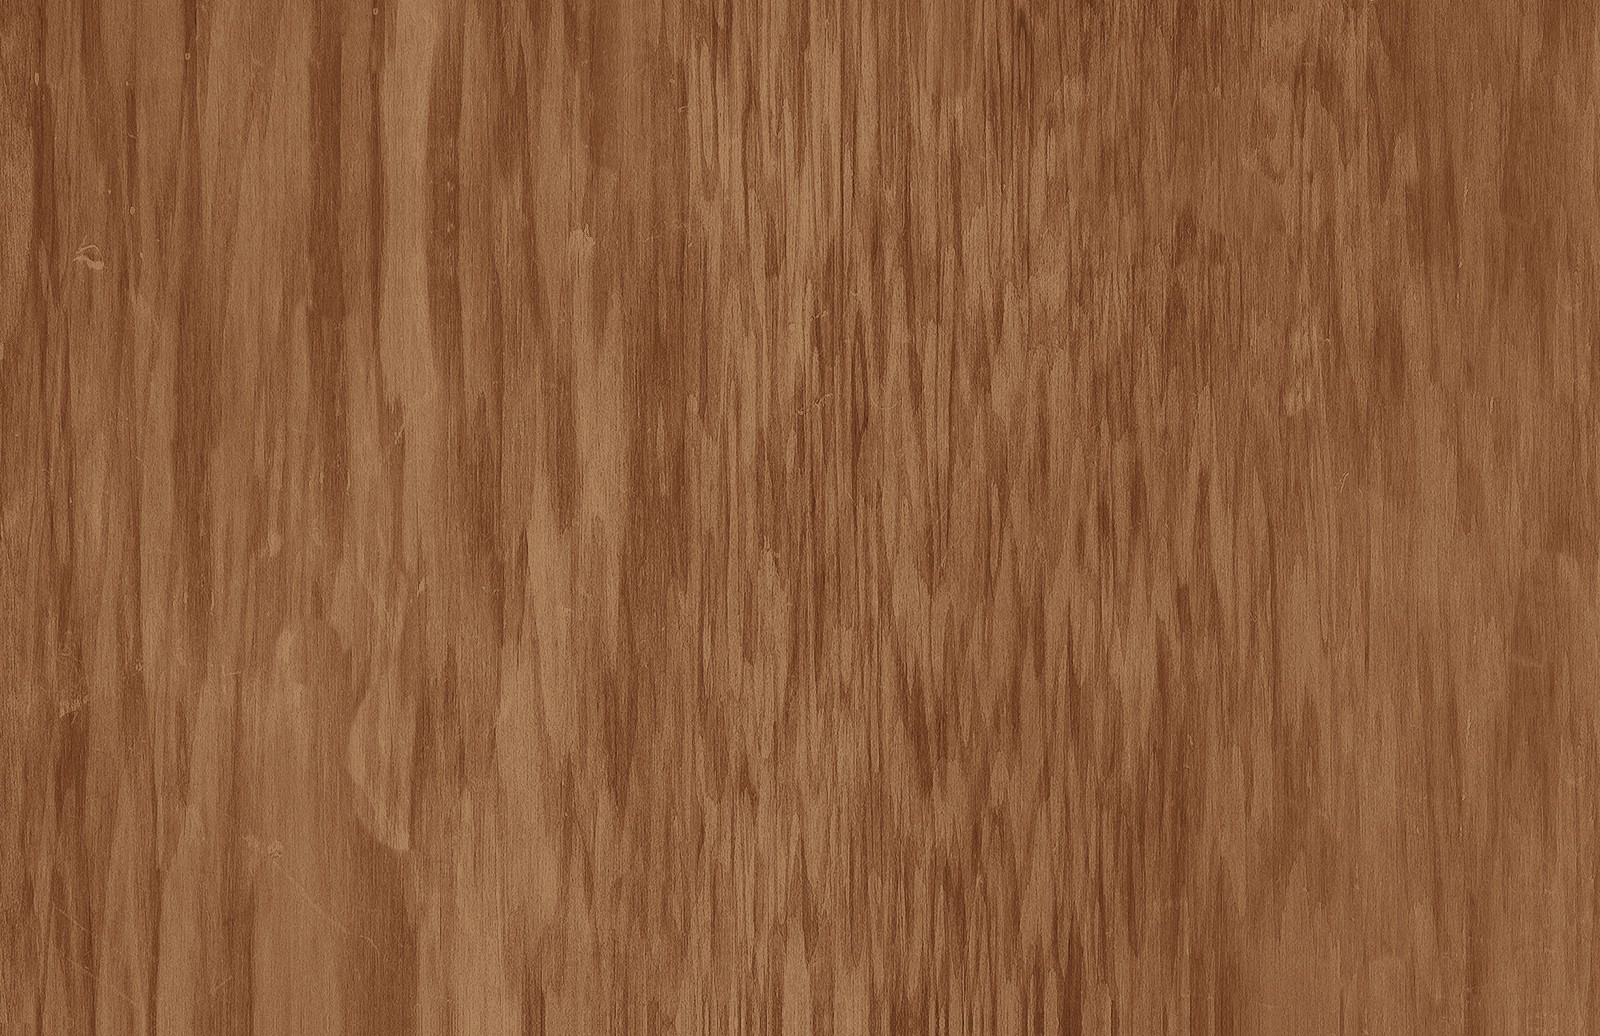 Wood texture seamless  Free Seamless Wood Textures — Medialoot